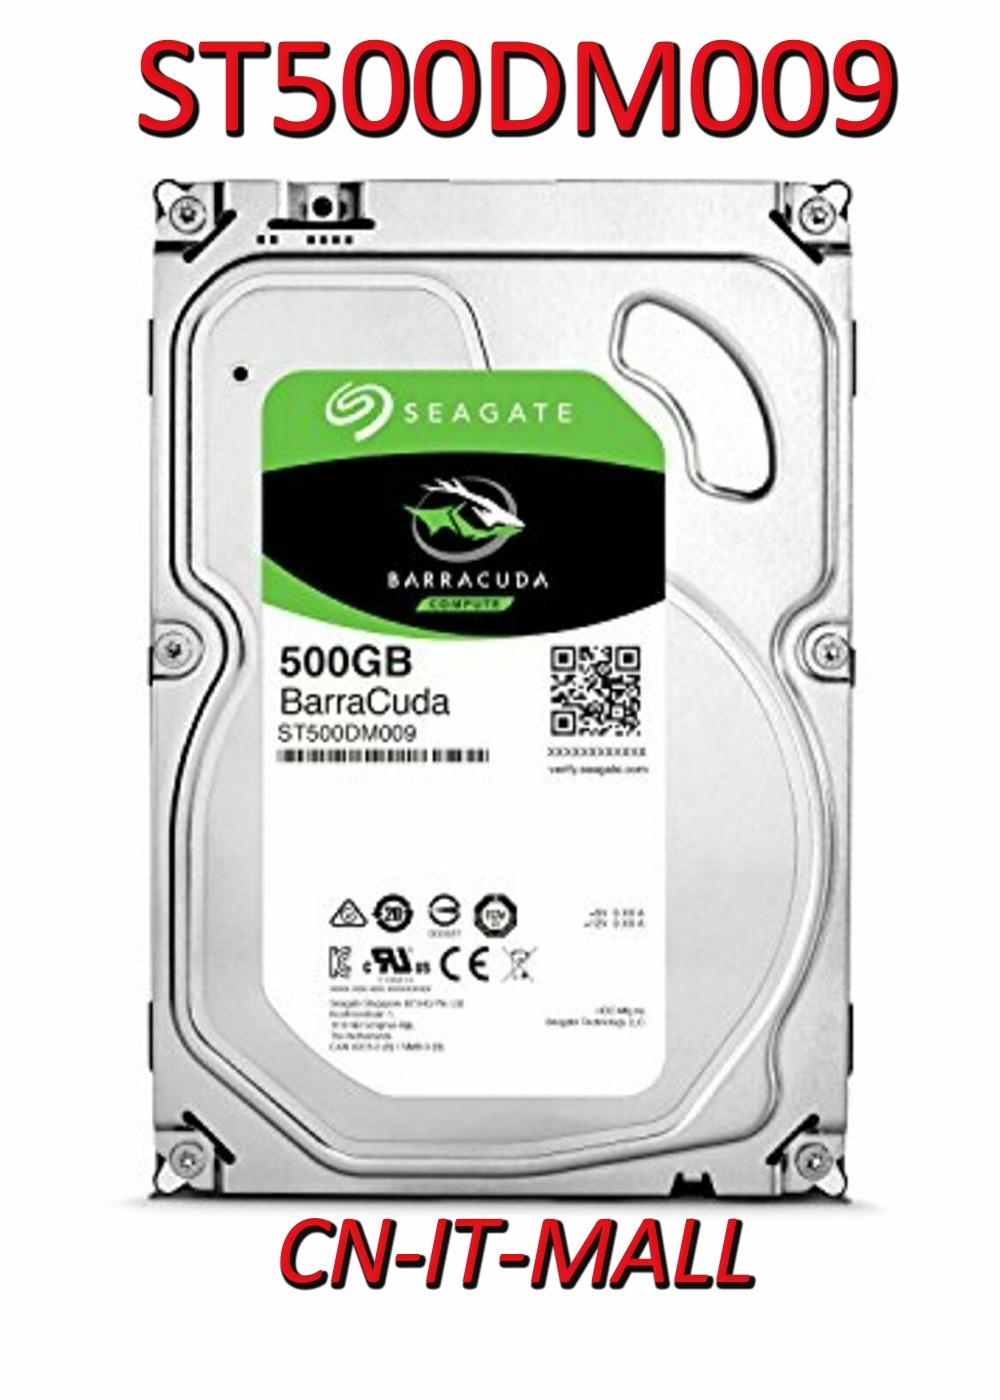 Seagate BarraCuda ST500DM009 500GB 7200 RPM 32MB Cache SATA 6.0Gb/s 3.5